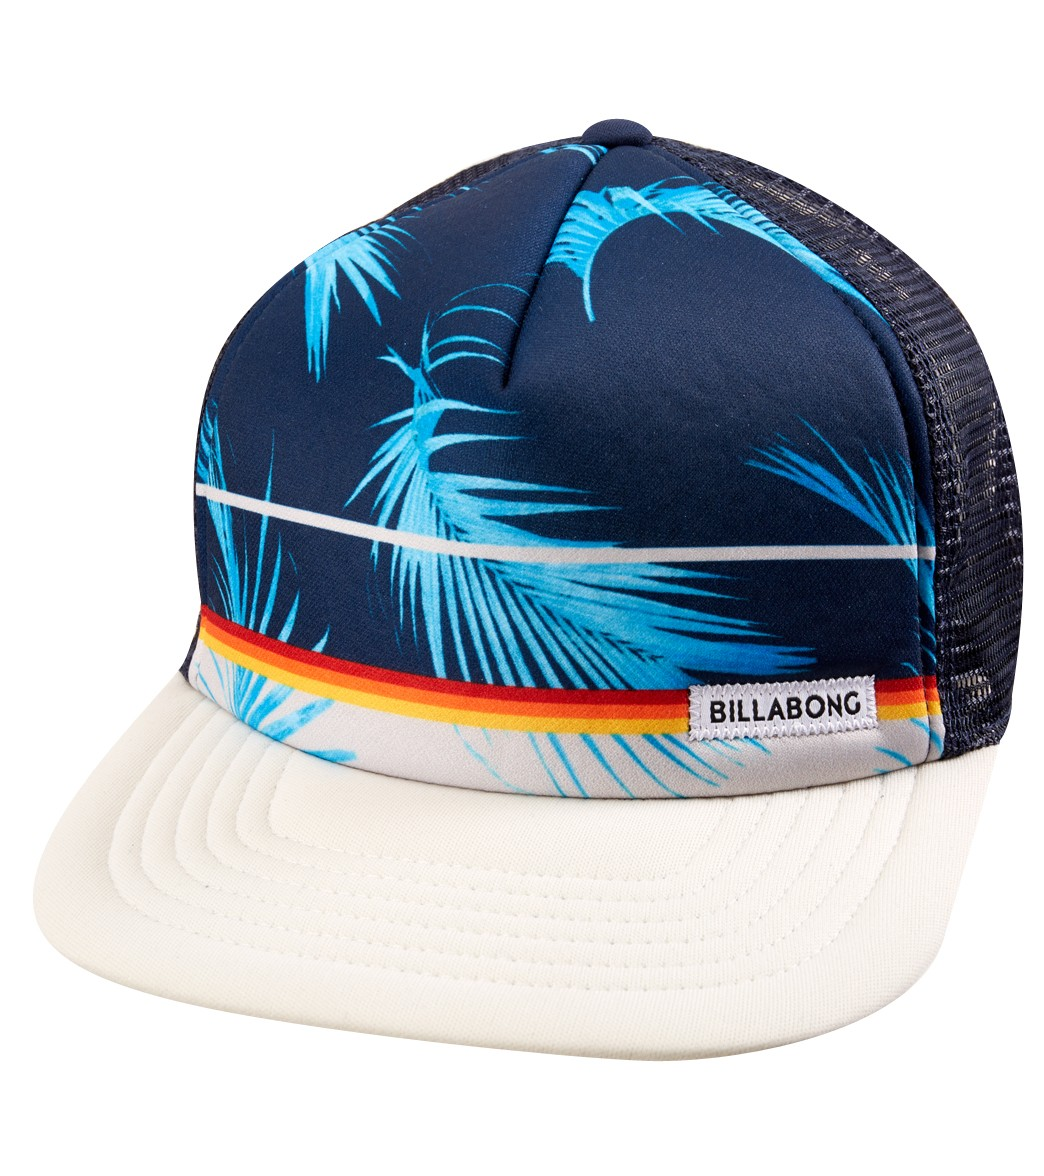 13c3f13f6d9 Billabong Men s Spinner Trucker Hat at SwimOutlet.com